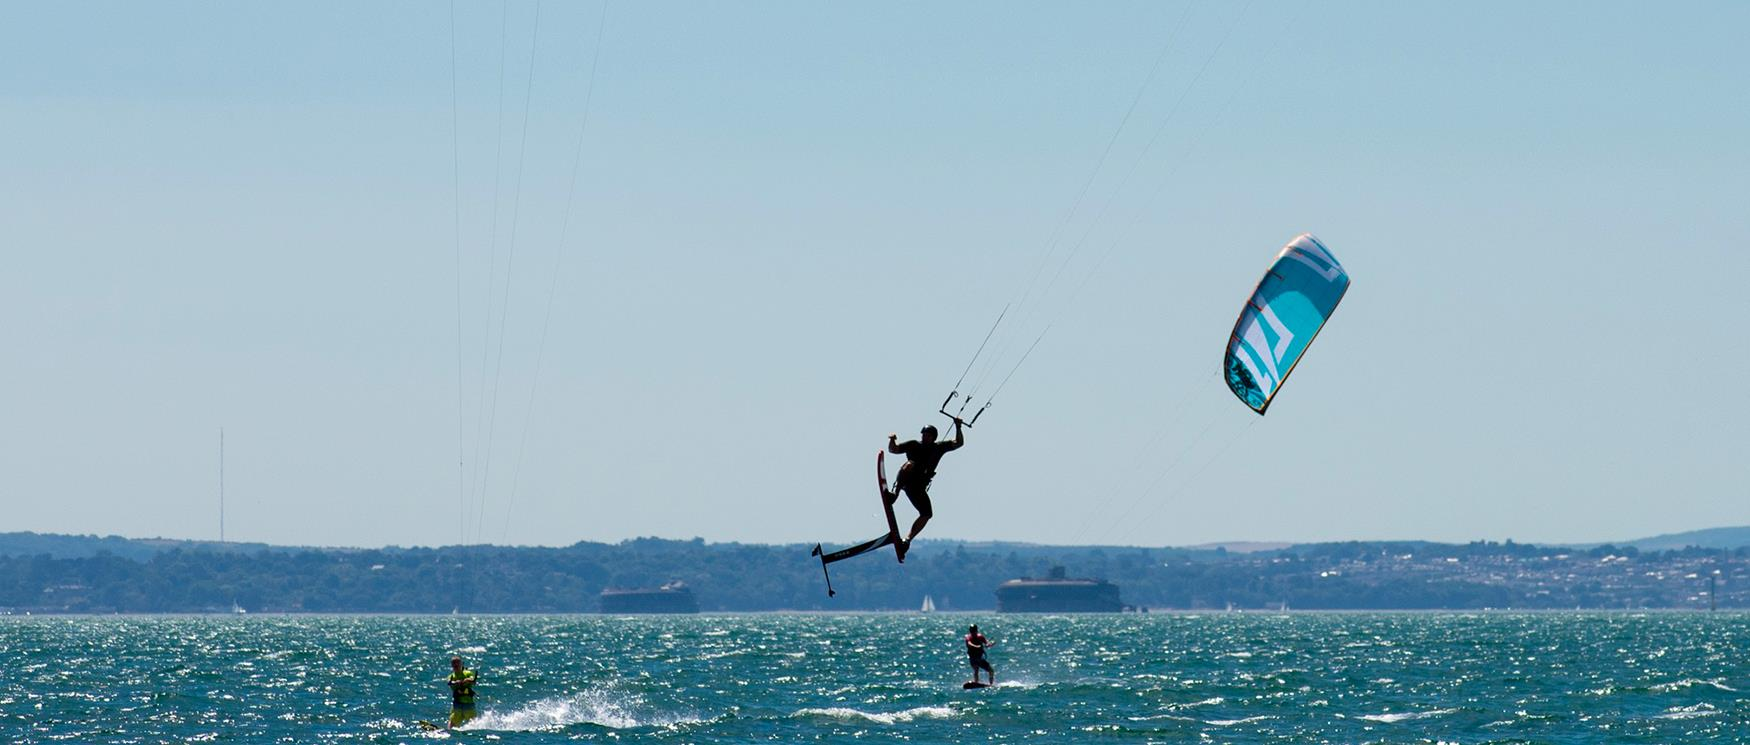 Hayling Island Beach and Kite Surfer